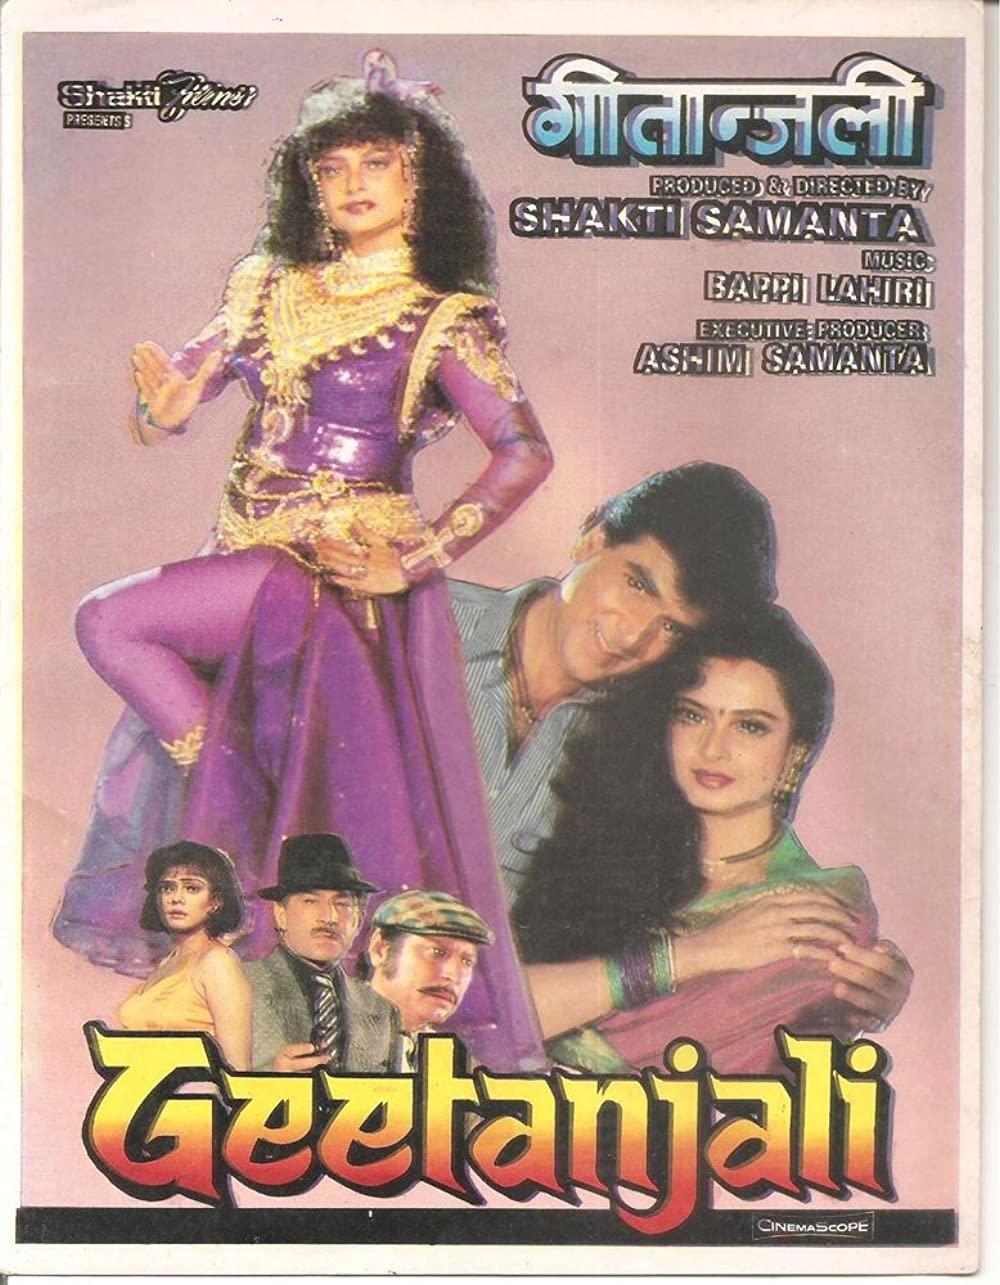 مشاهدة فيلم Geetanjali (1993) مترجم